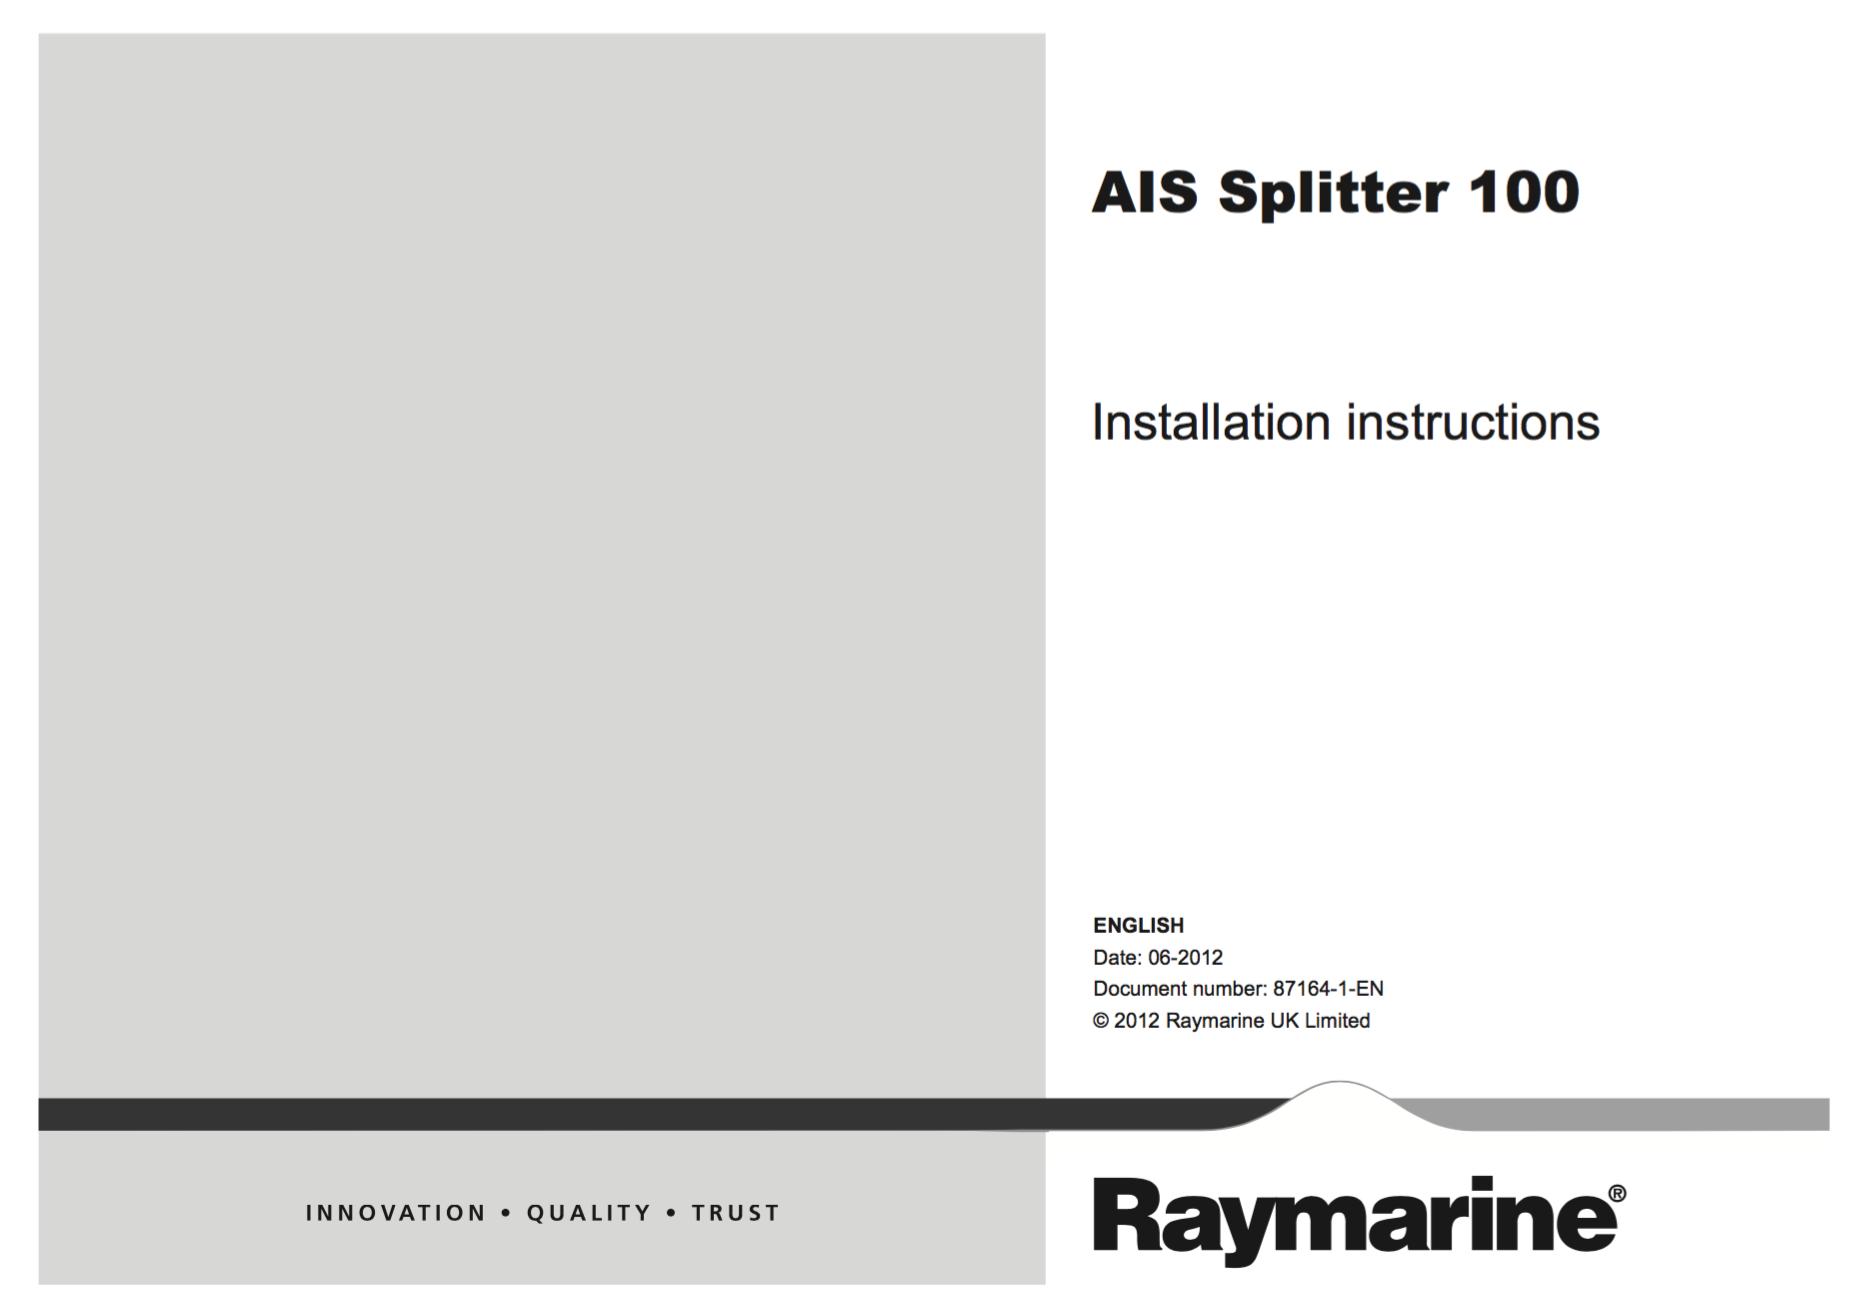 ais splitter 100 installation instructions